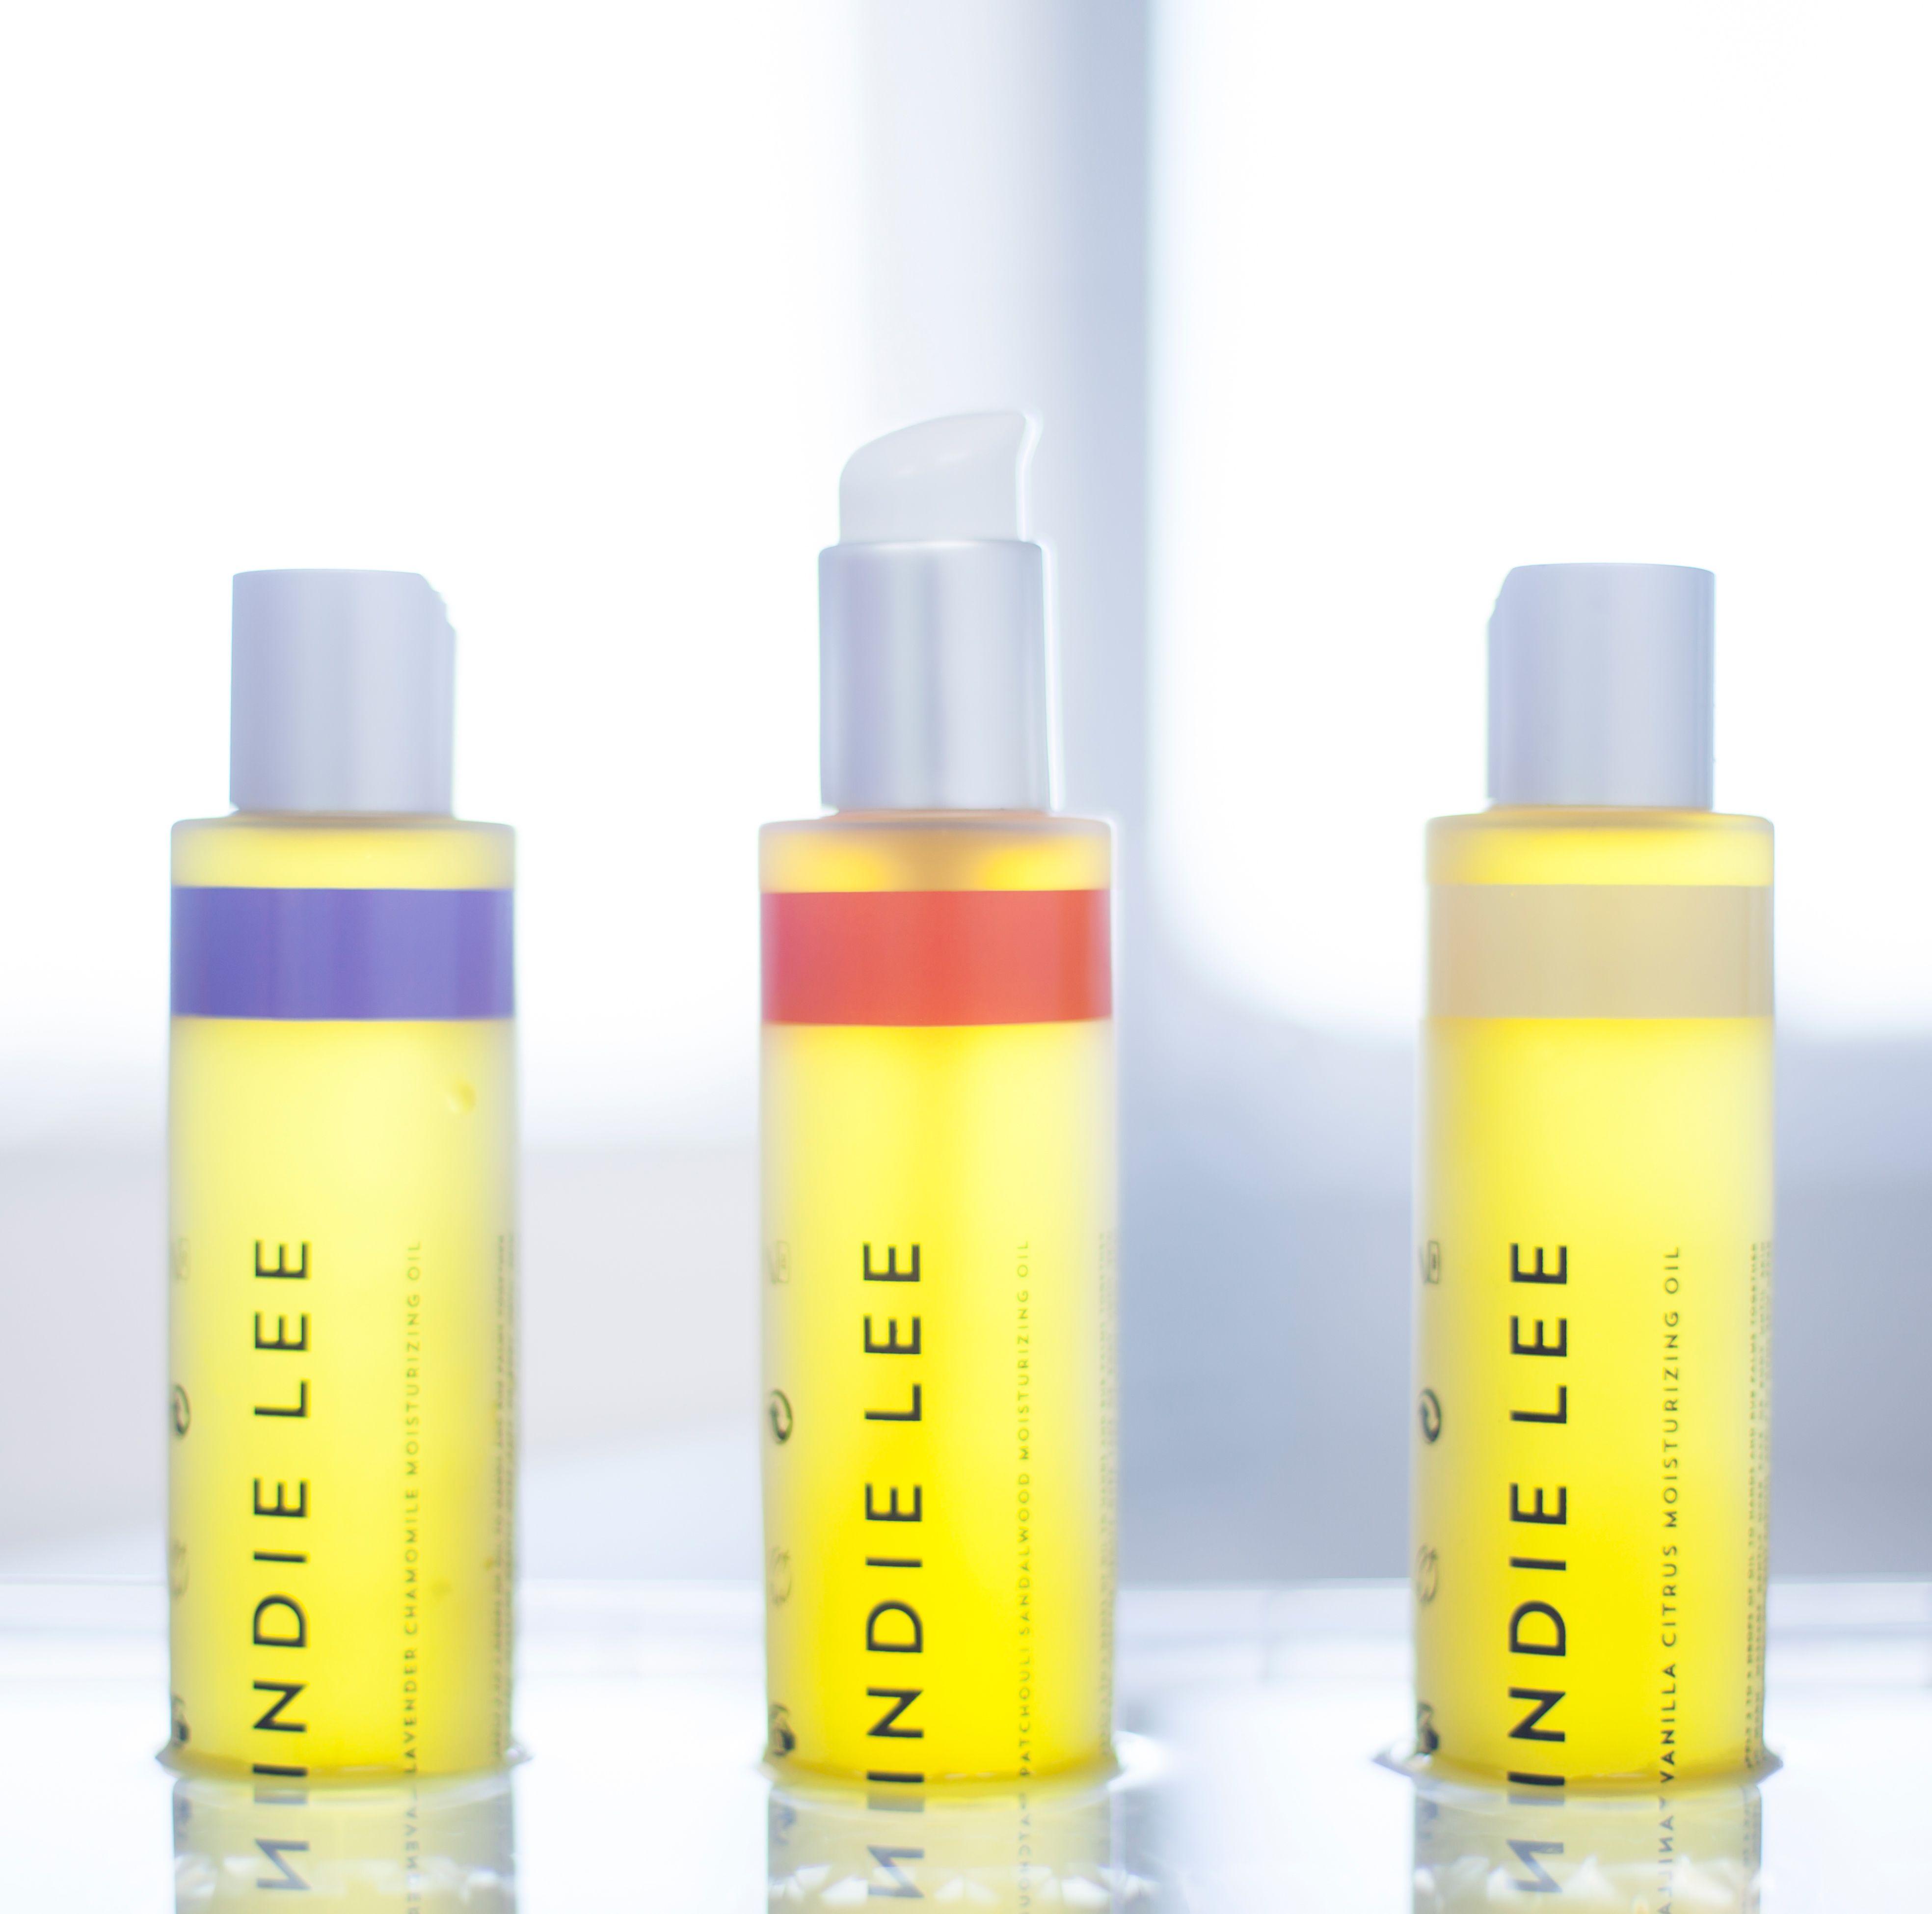 Indie Lee Body Oils IndieLee skincare greenbeauty